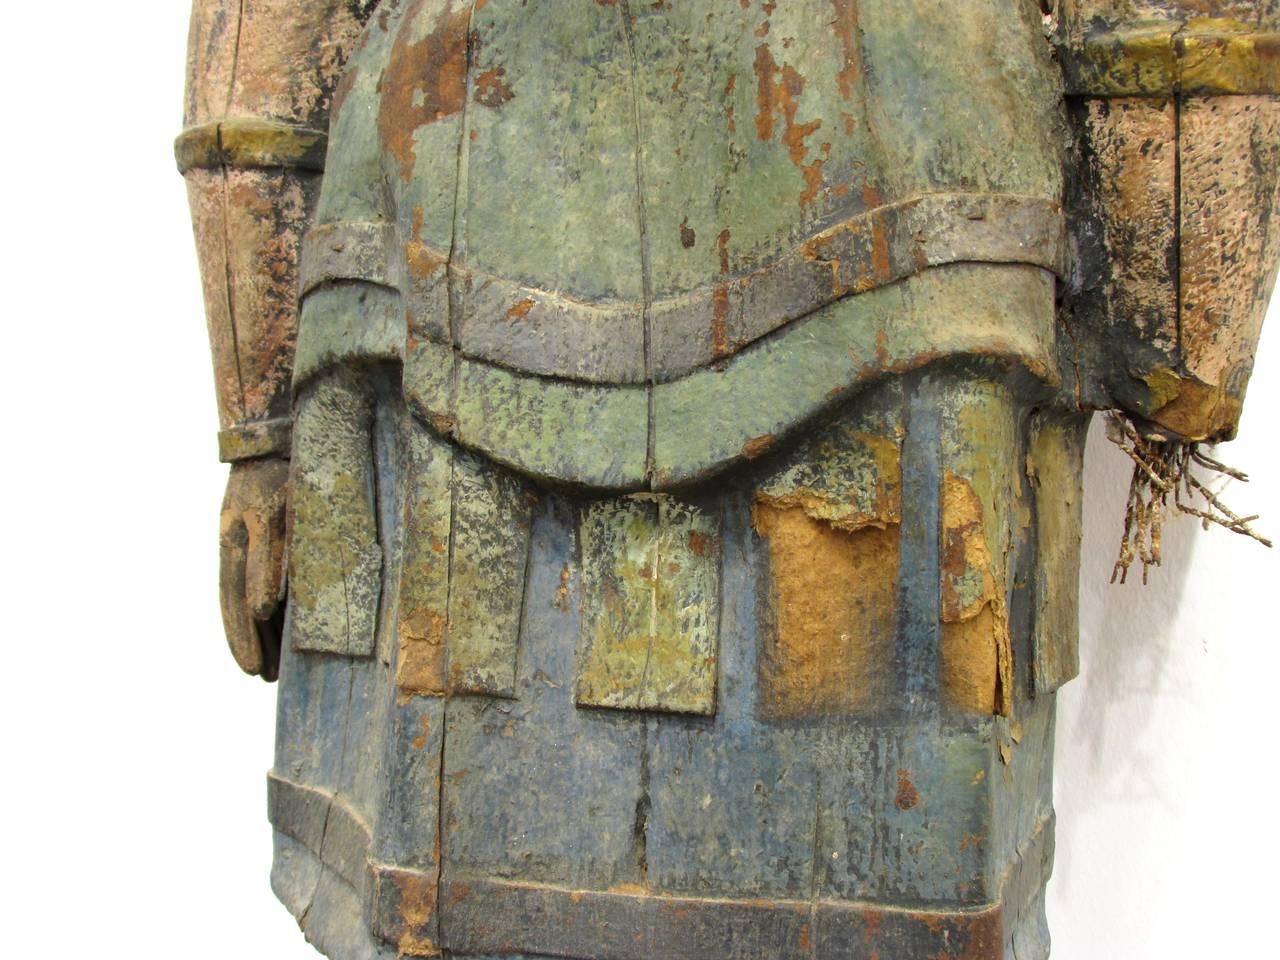 Paper Mache Viking Shieldmaiden Image 6